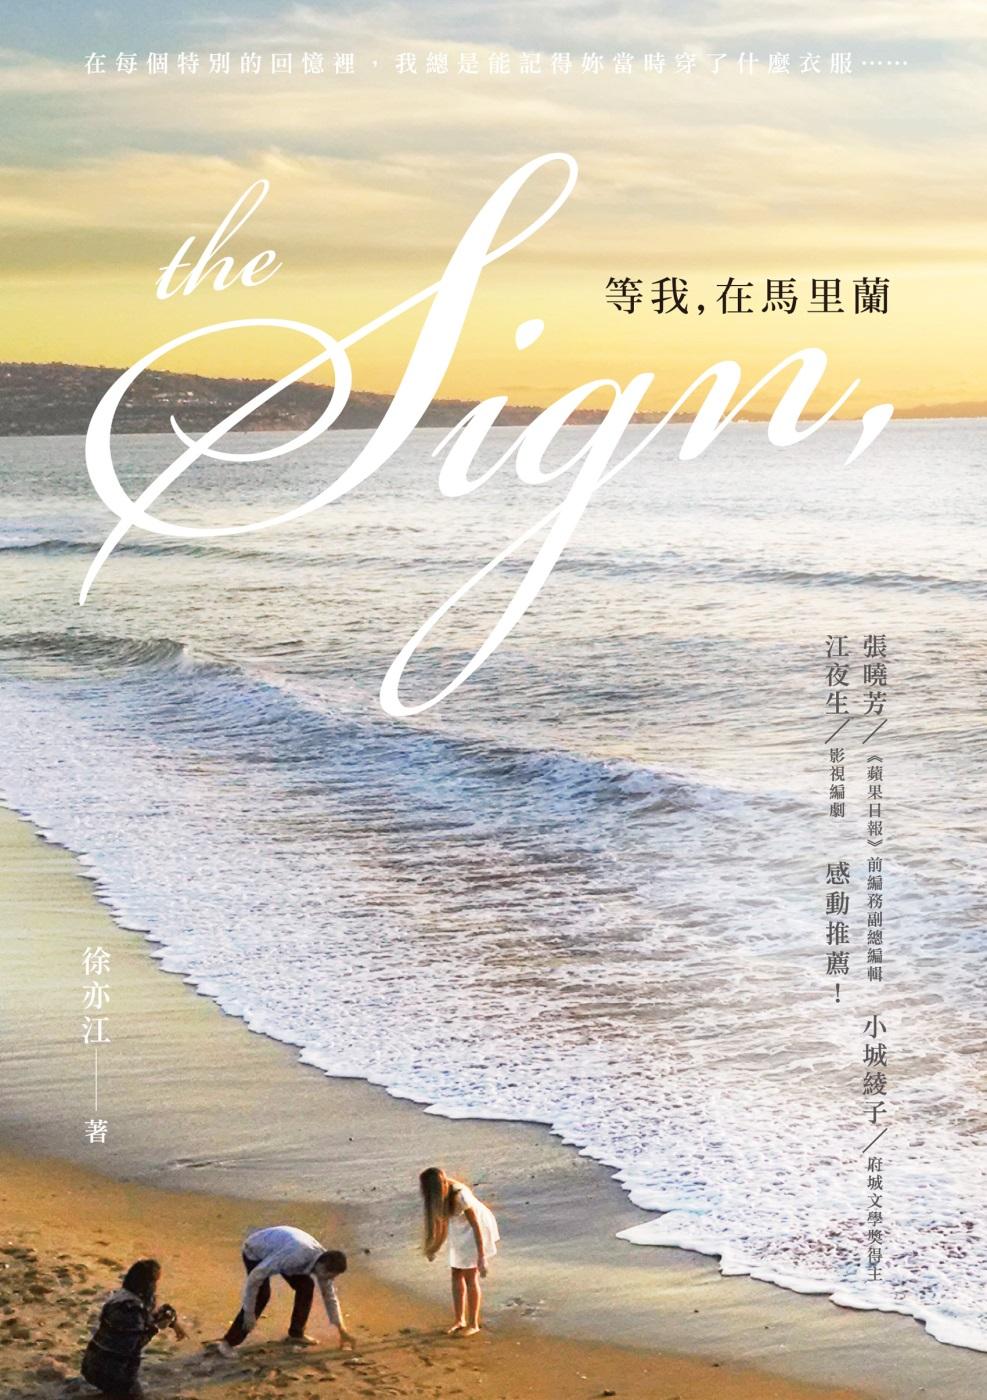 《The Sign,等我,在馬里蘭》 商品條碼,ISBN:9789863265221